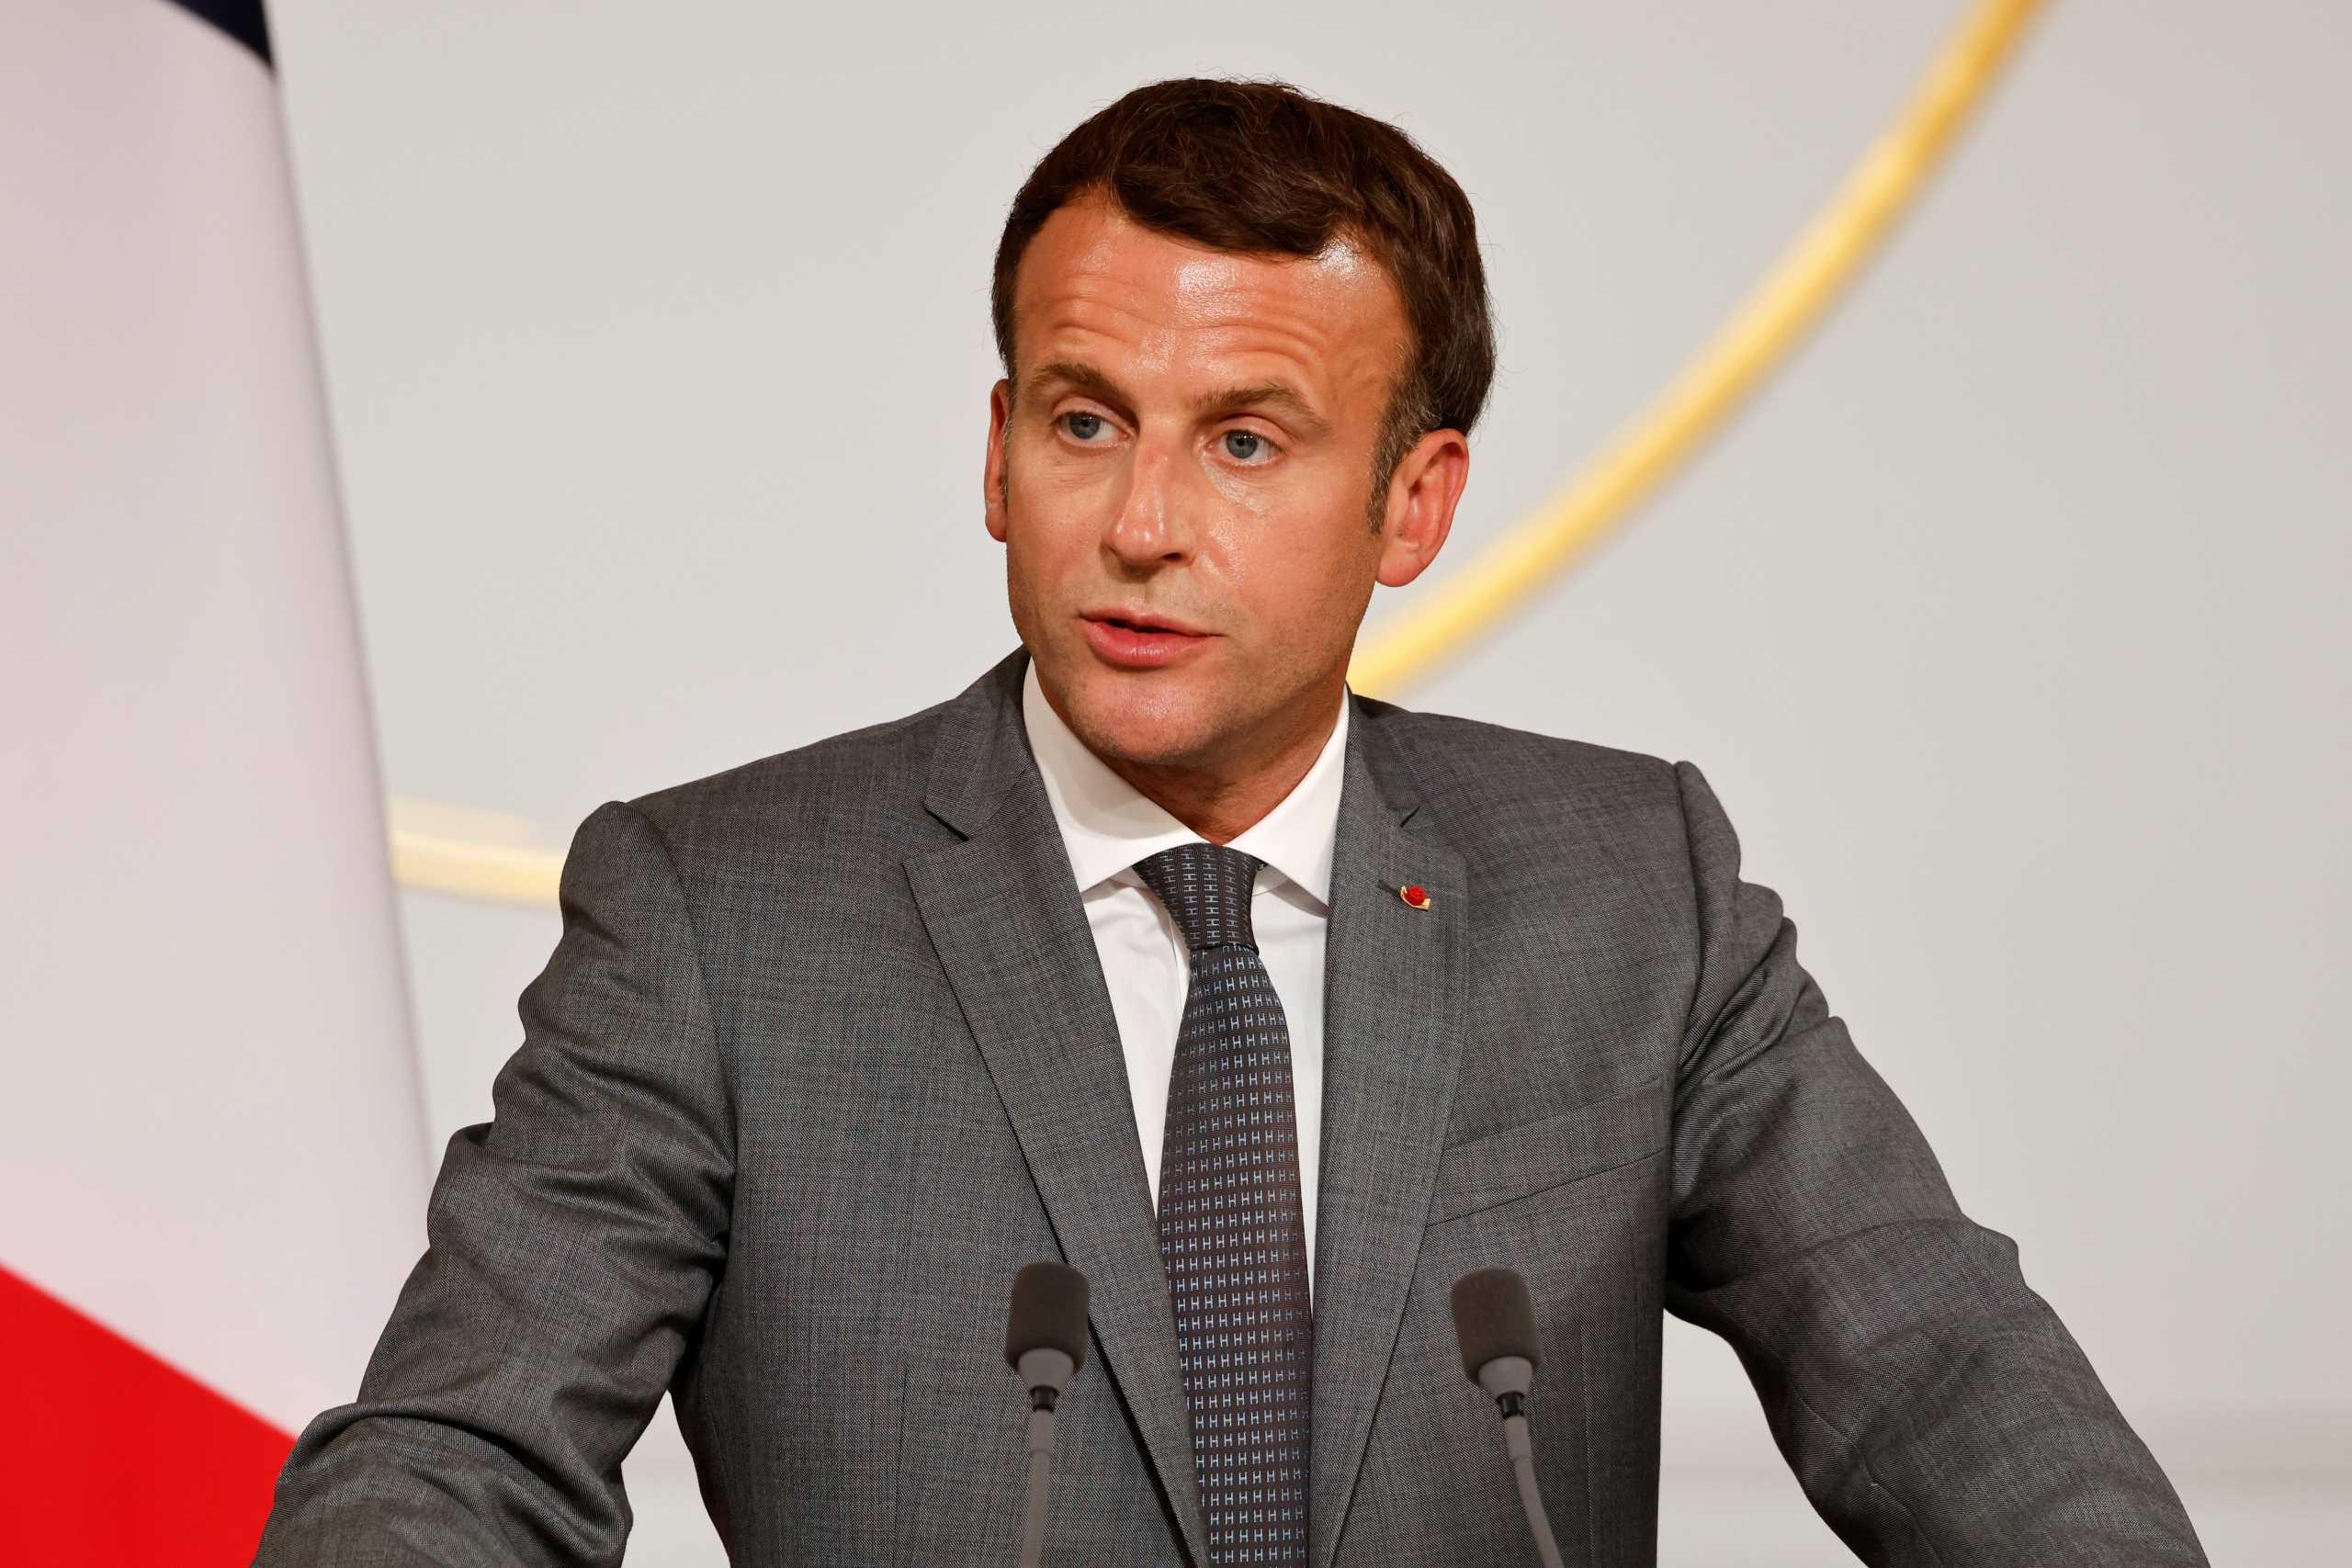 AUKUS: Τηλεφωνική επικοινωνία Εμανουέλ Μακρόν και Τζο Μπάιντεν – Η Γαλλία ζητά εξηγήσεις